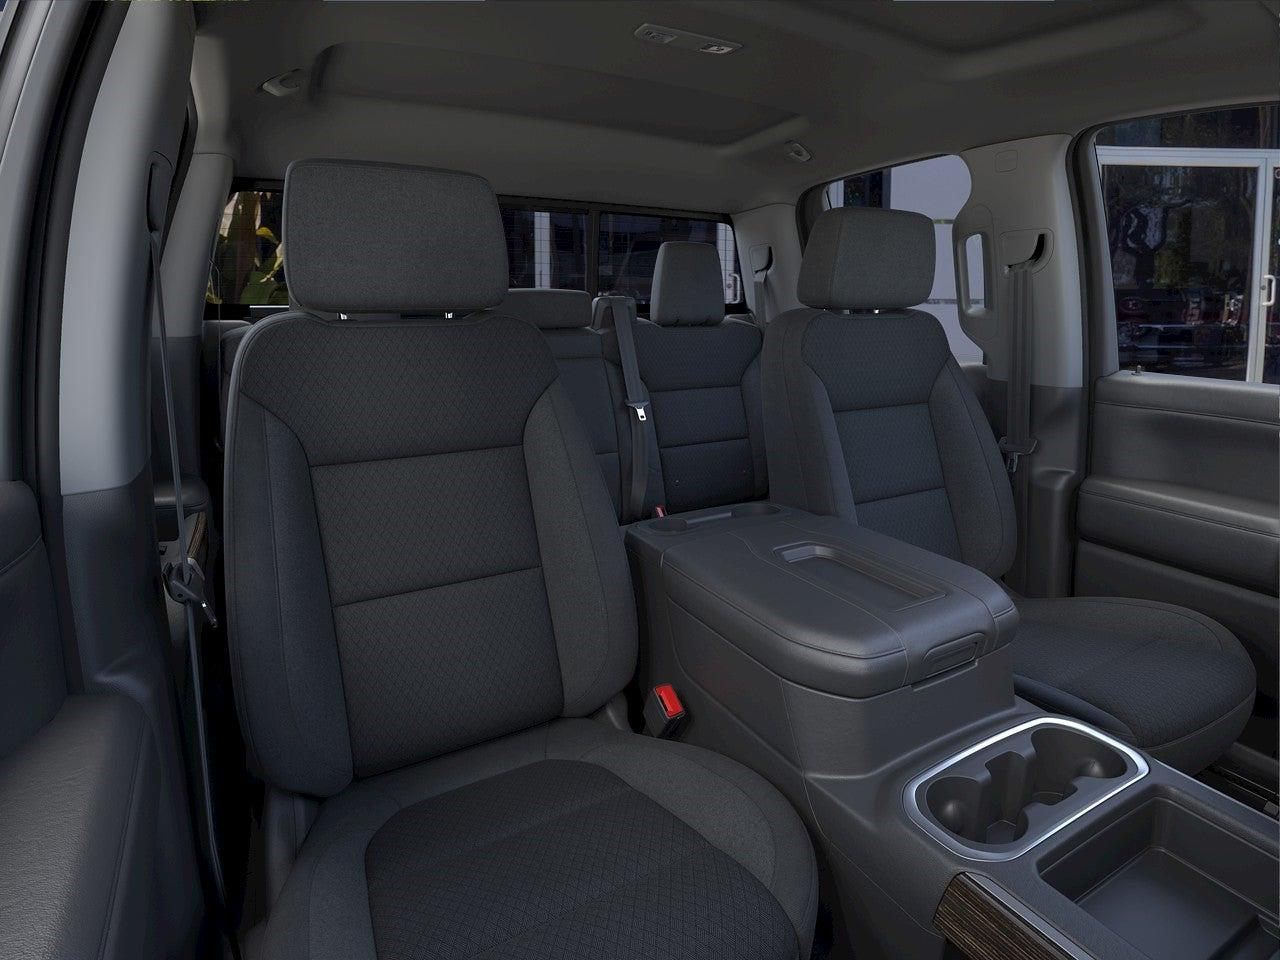 2021 GMC Sierra 1500 Double Cab 4x2, Pickup #T21367 - photo 13